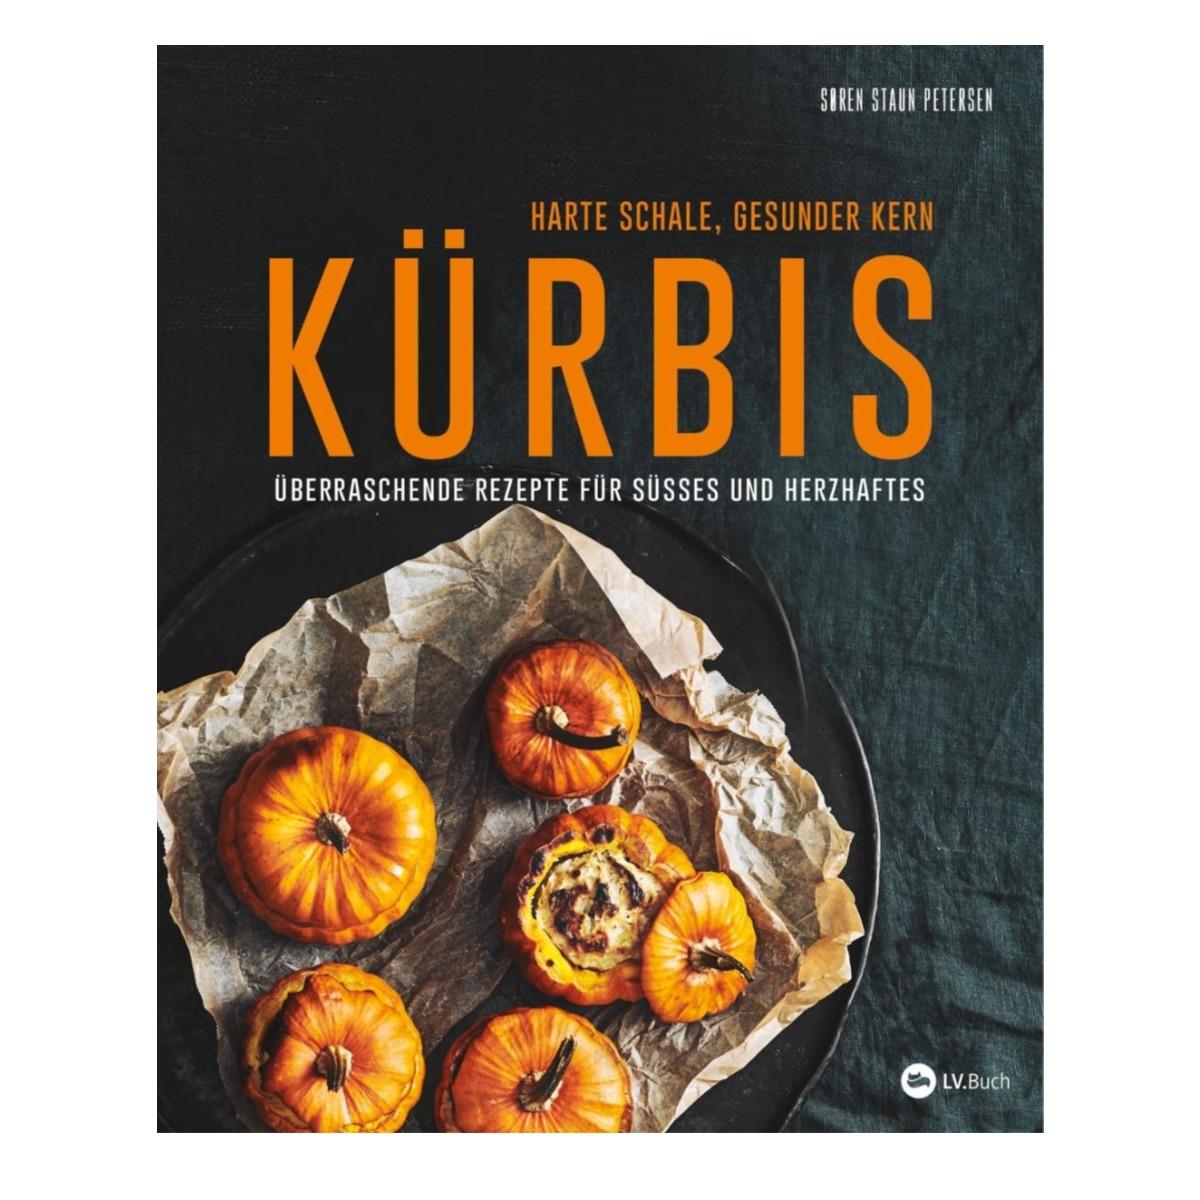 Kürbis Kochbuch von Soeren Staun Petersen